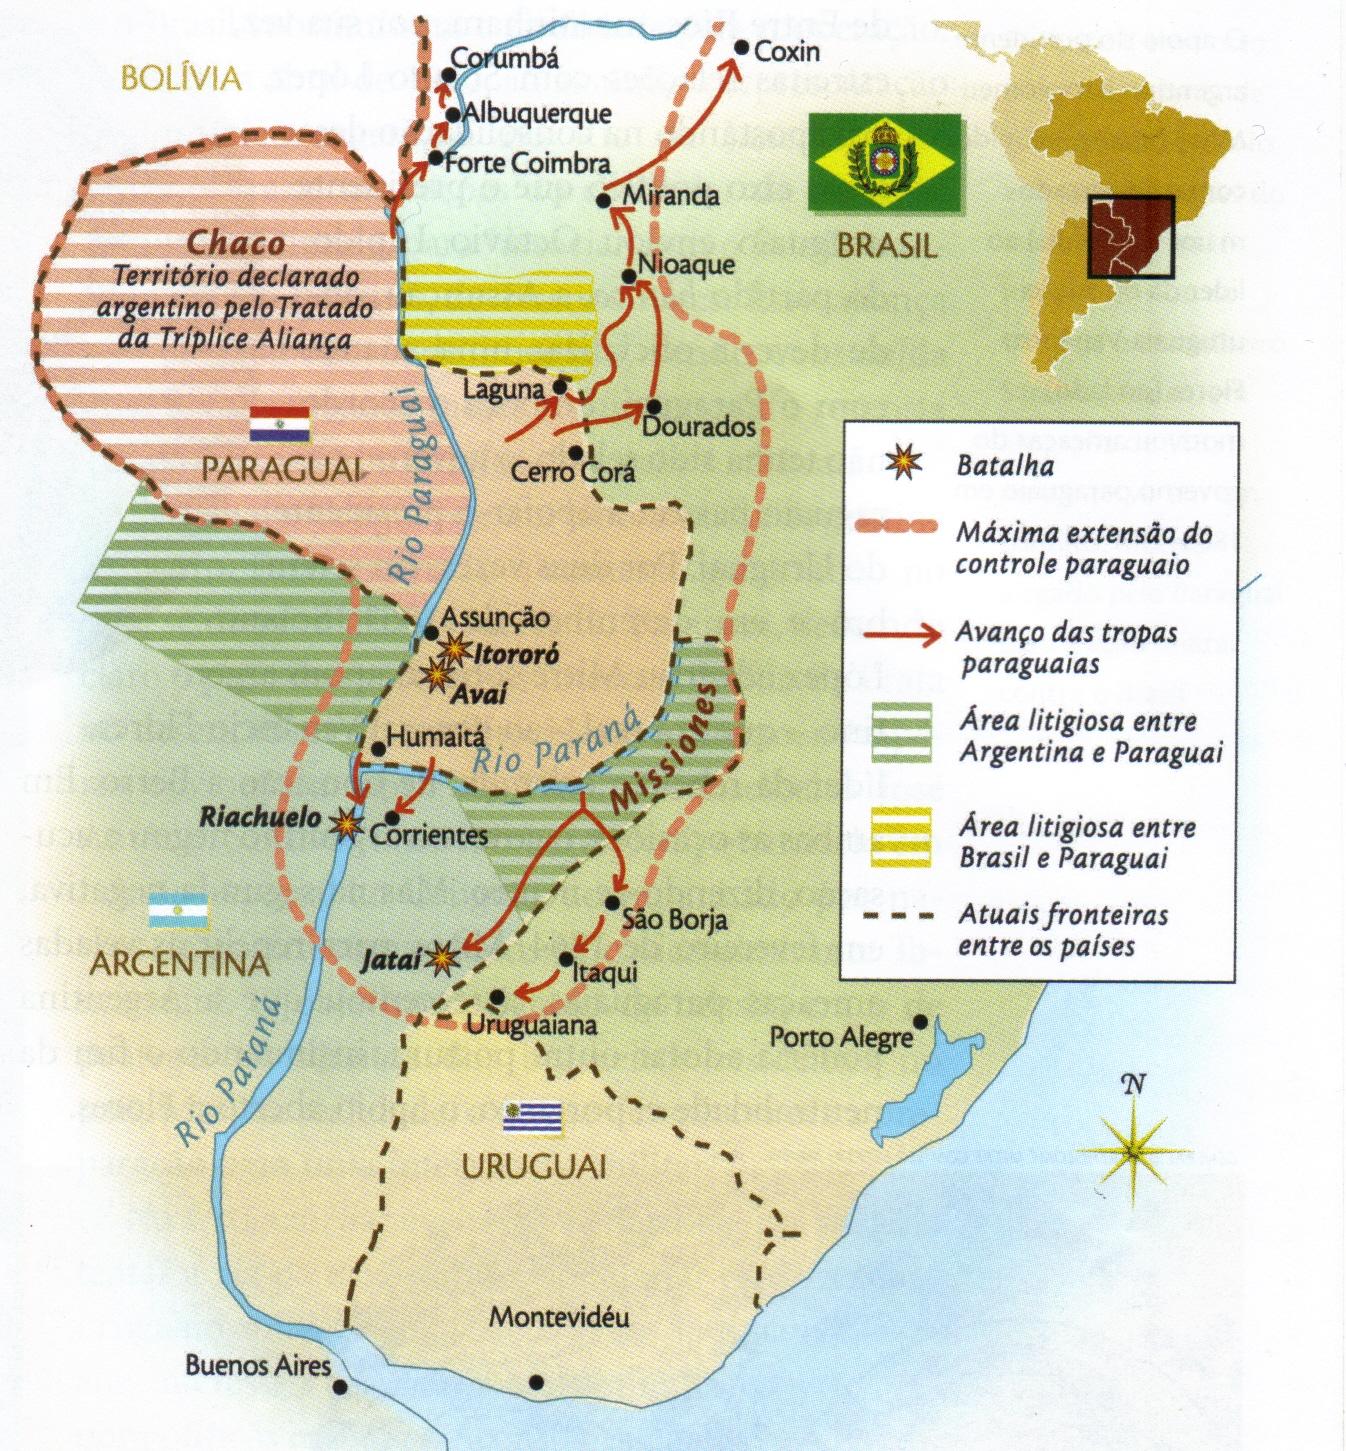 Mapa da Guerra do Paraguai